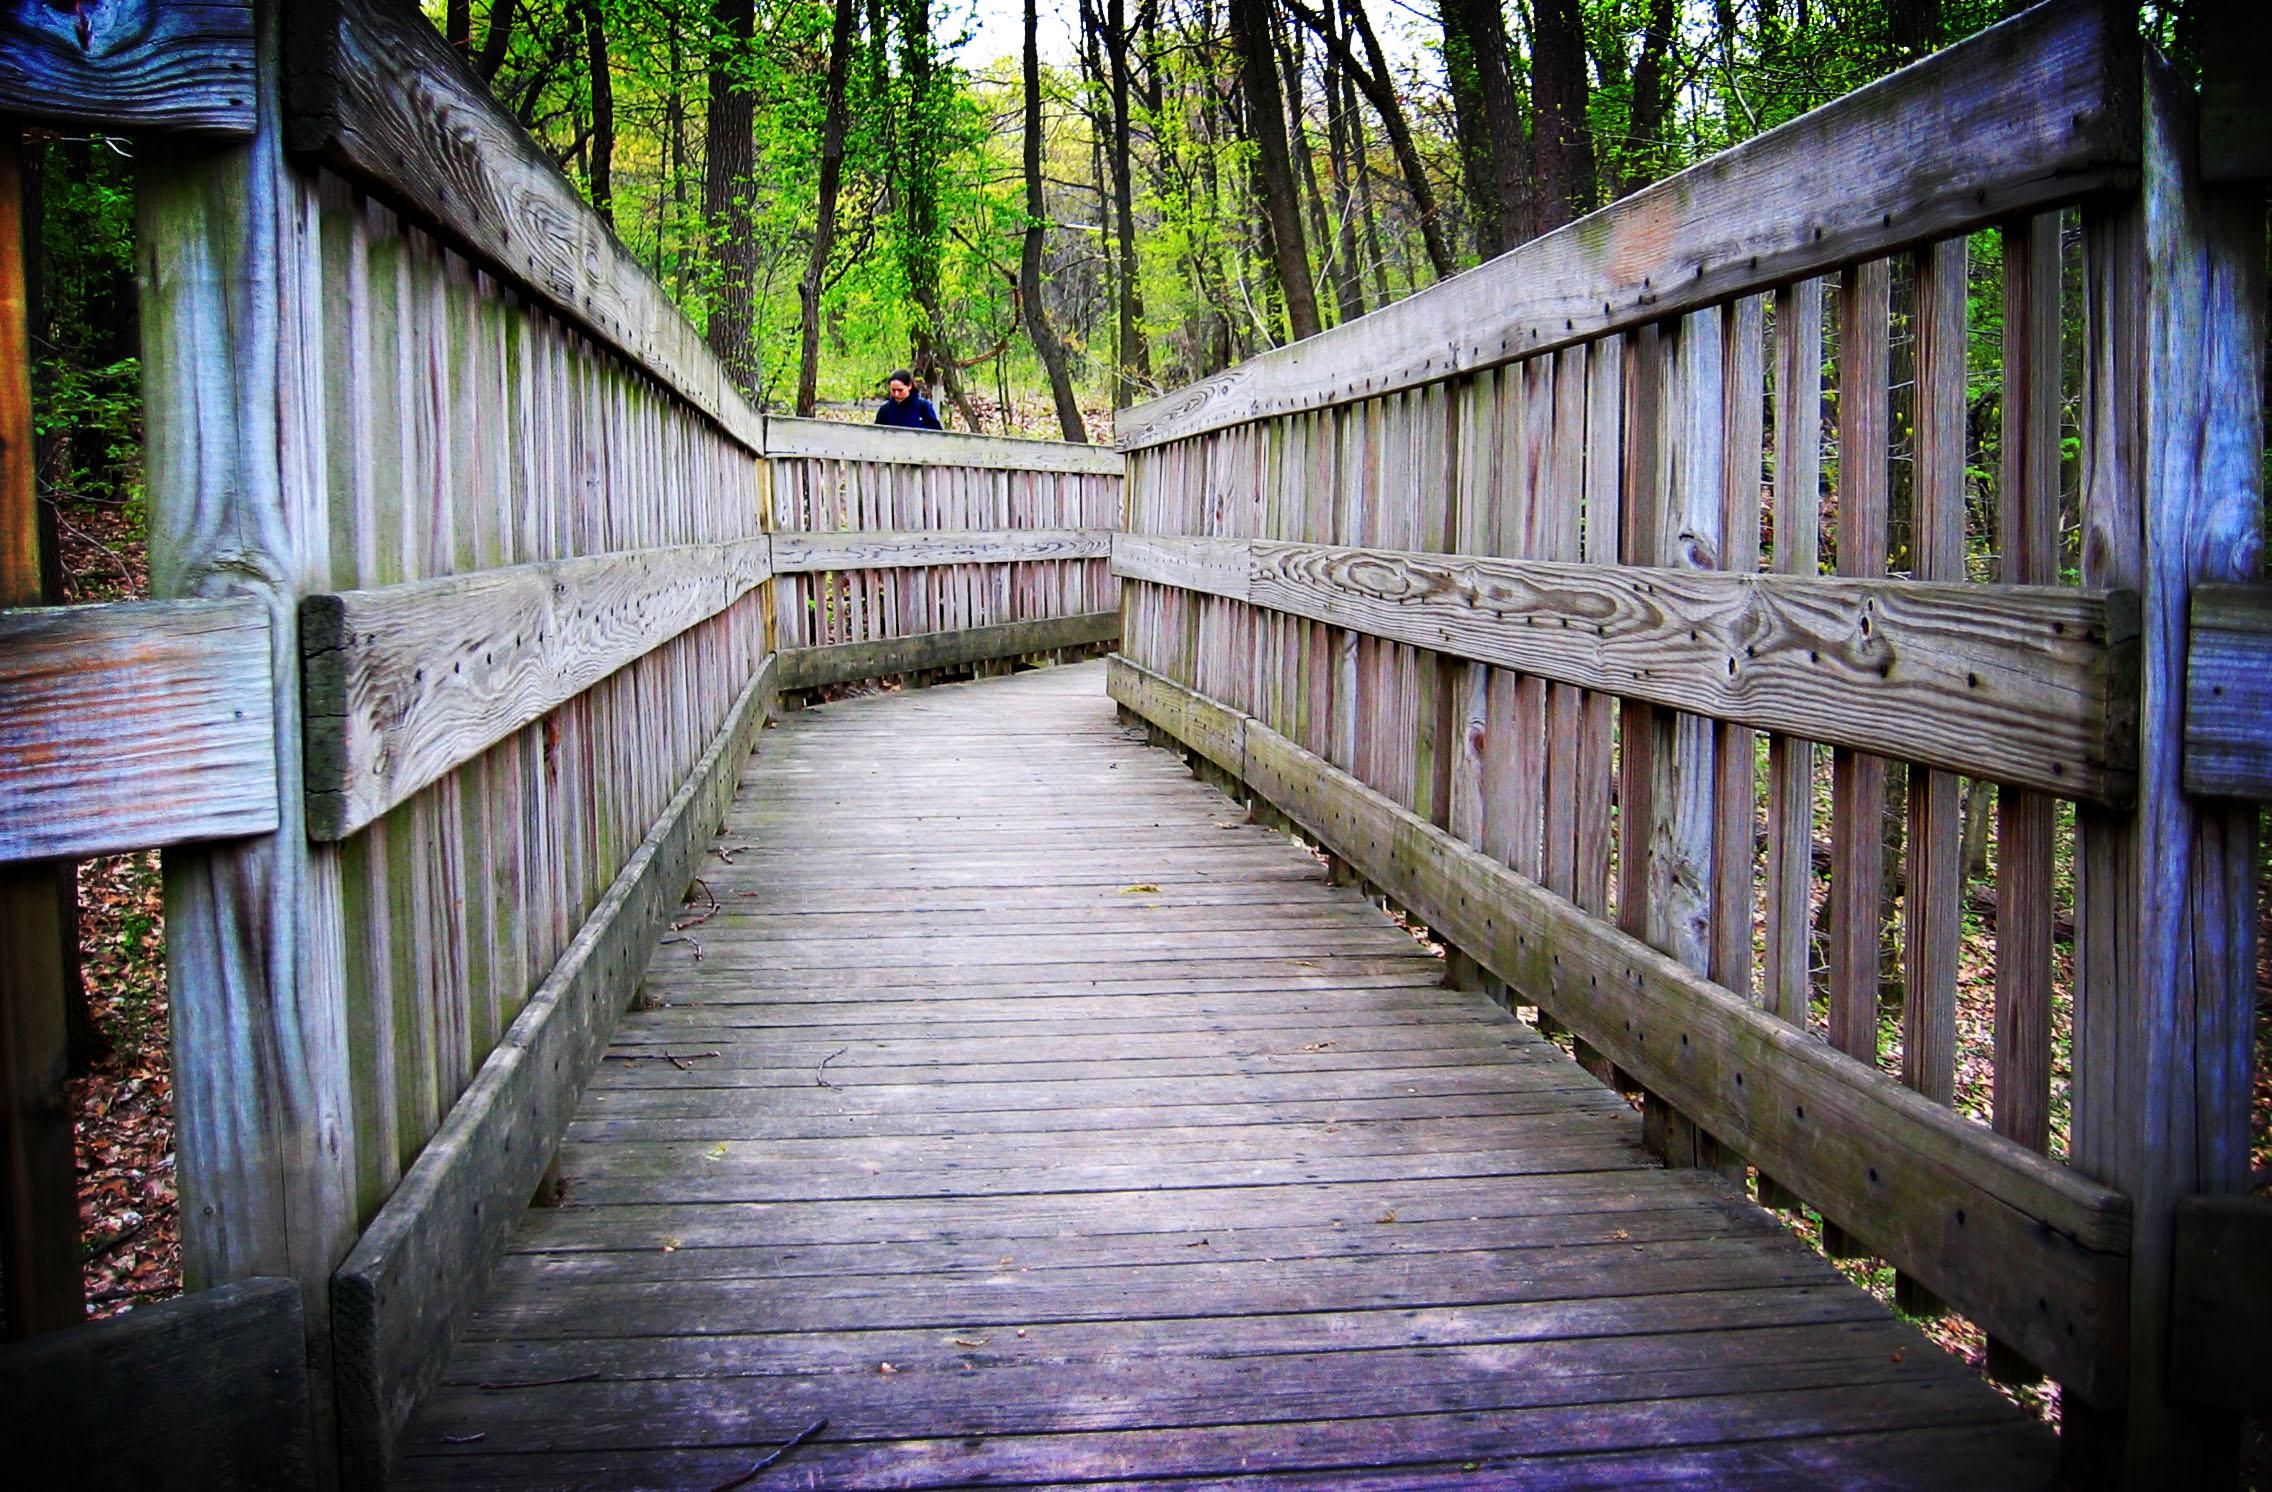 File:Wooden walkway.jpg - Wikimedia Commons